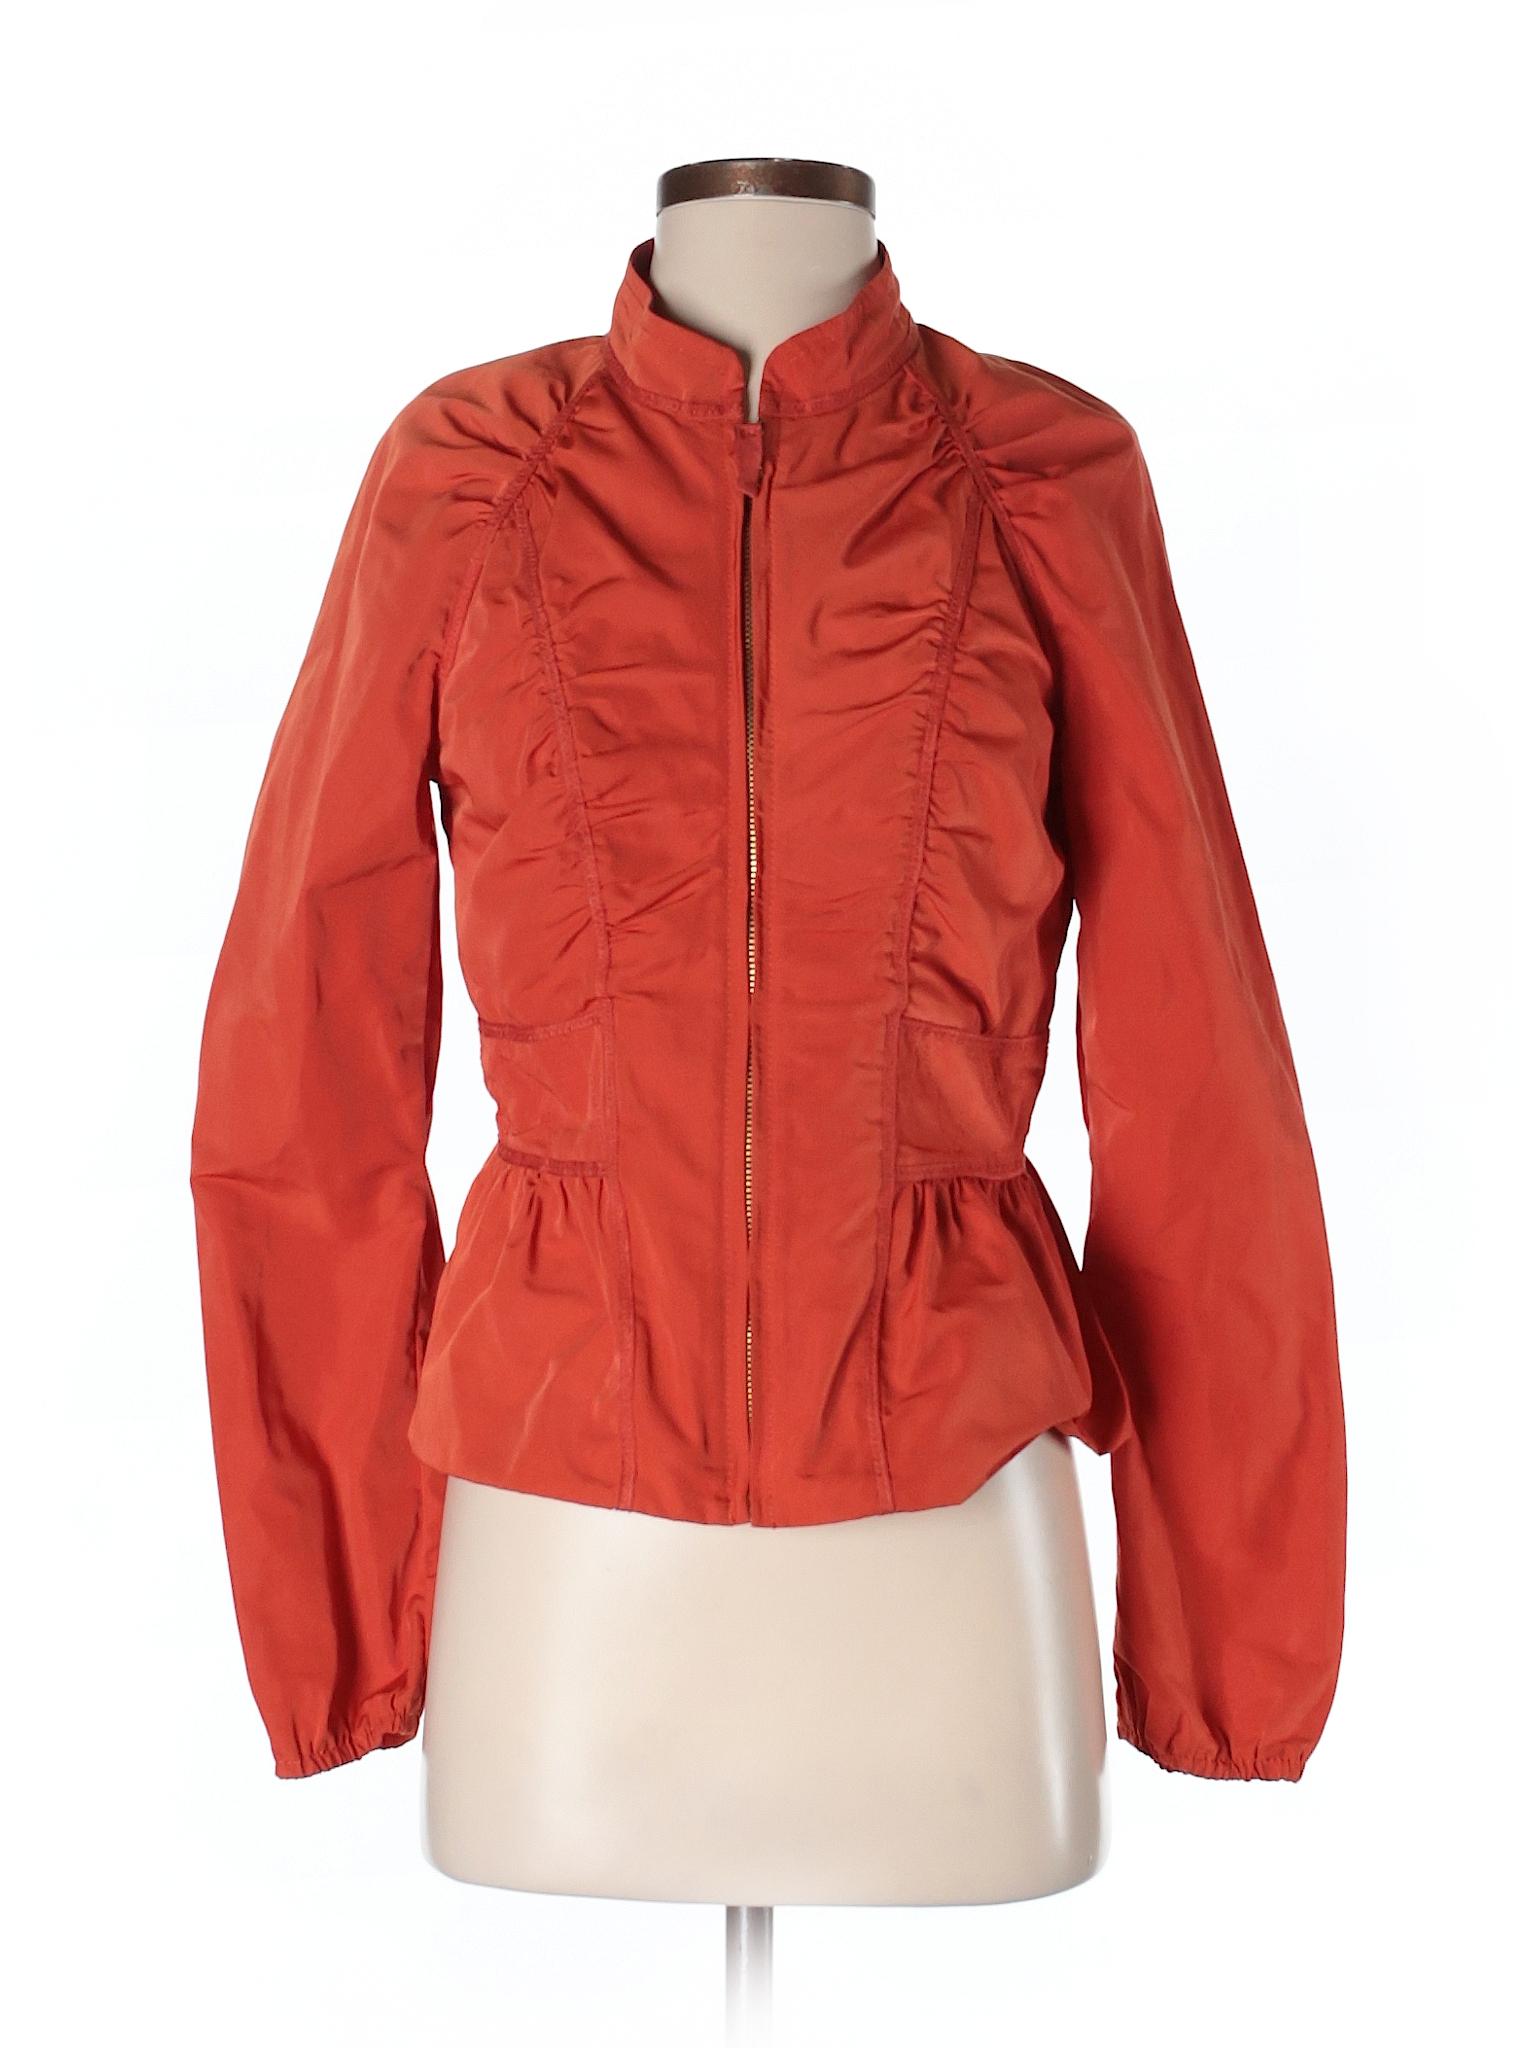 Boutique BCBGMAXAZRIA BCBGMAXAZRIA Boutique Boutique Jacket BCBGMAXAZRIA Jacket Jacket Jacket BCBGMAXAZRIA Boutique Boutique Aqwgn5FvU